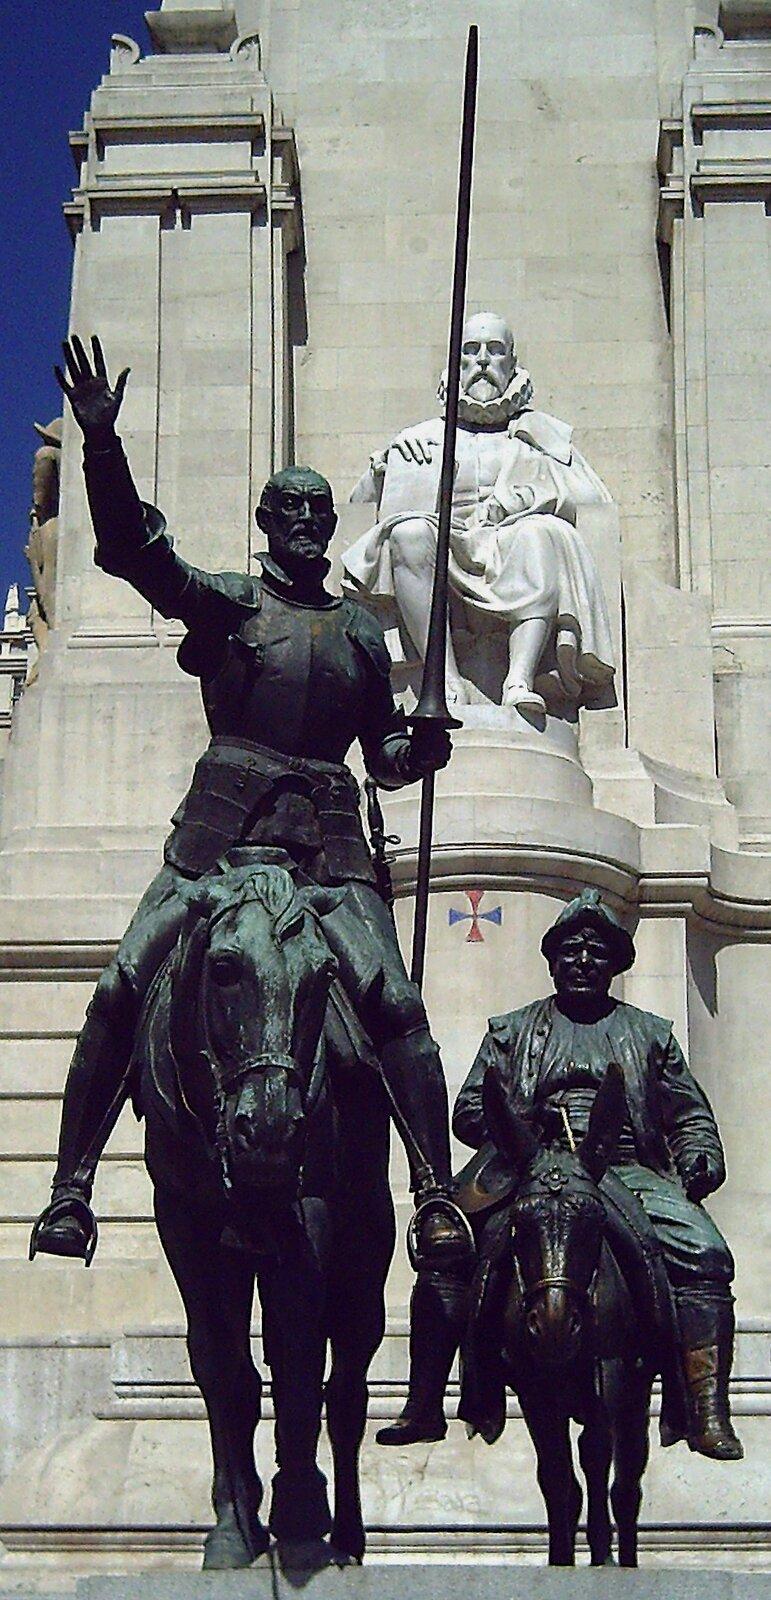 Cervantes – pomnik wMadrycie – zprzodu widać postaci Don Kichota iSancho Pansy fragment Cervantes – pomnik wMadrycie – zprzodu widać postaci Don Kichota iSancho Pansy fragment Źródło: Zaqarbal , Lorenzo Coullaut Valera, domena publiczna.